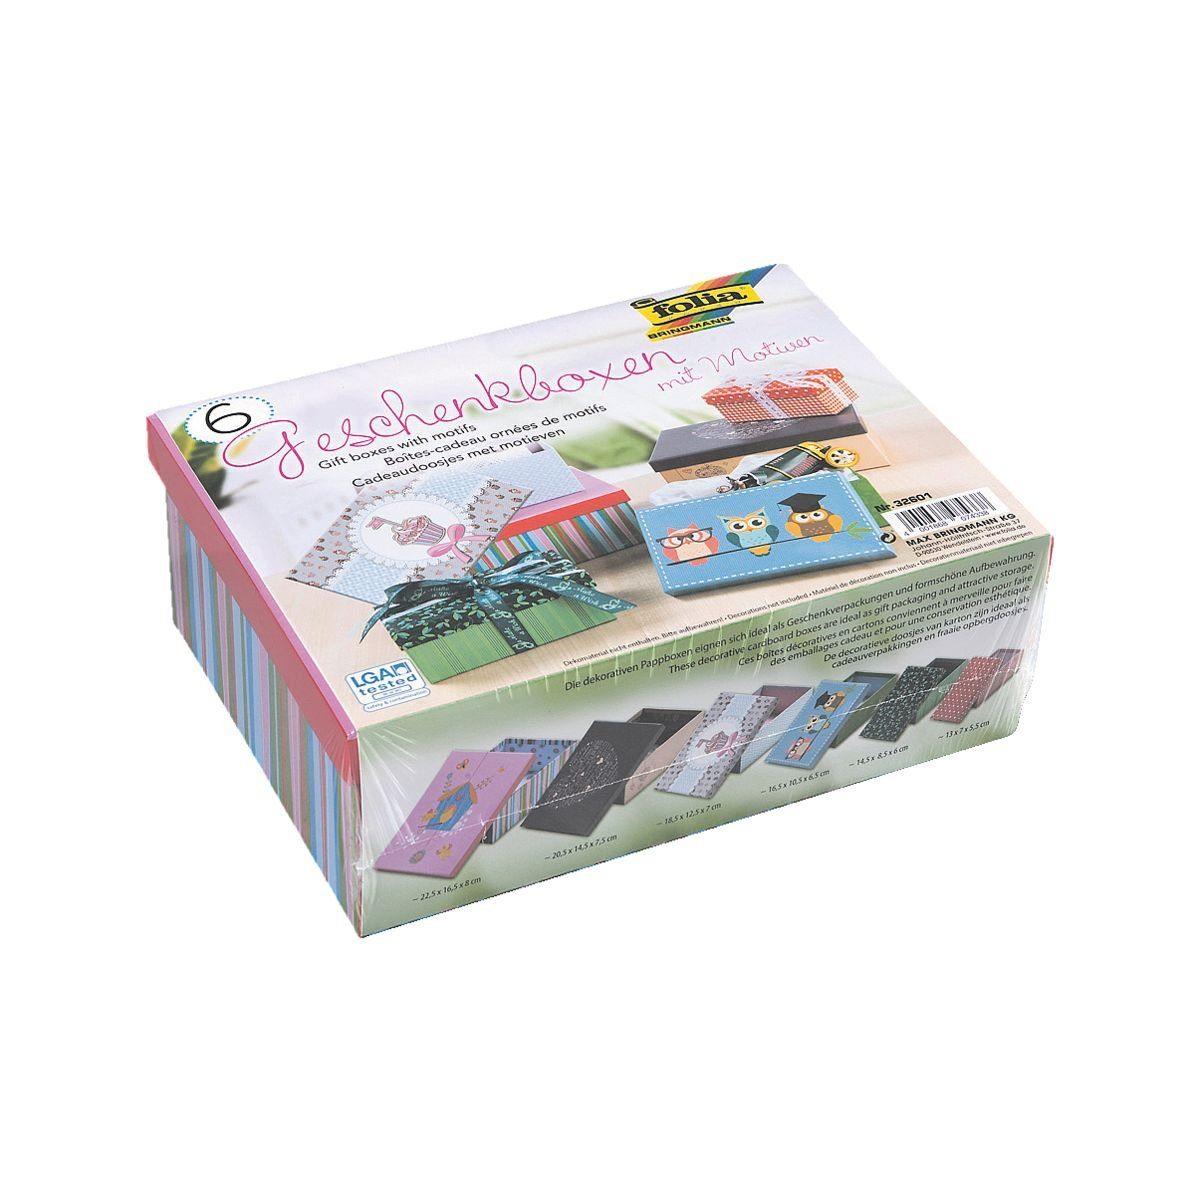 Folia Geschenkboxen-Set